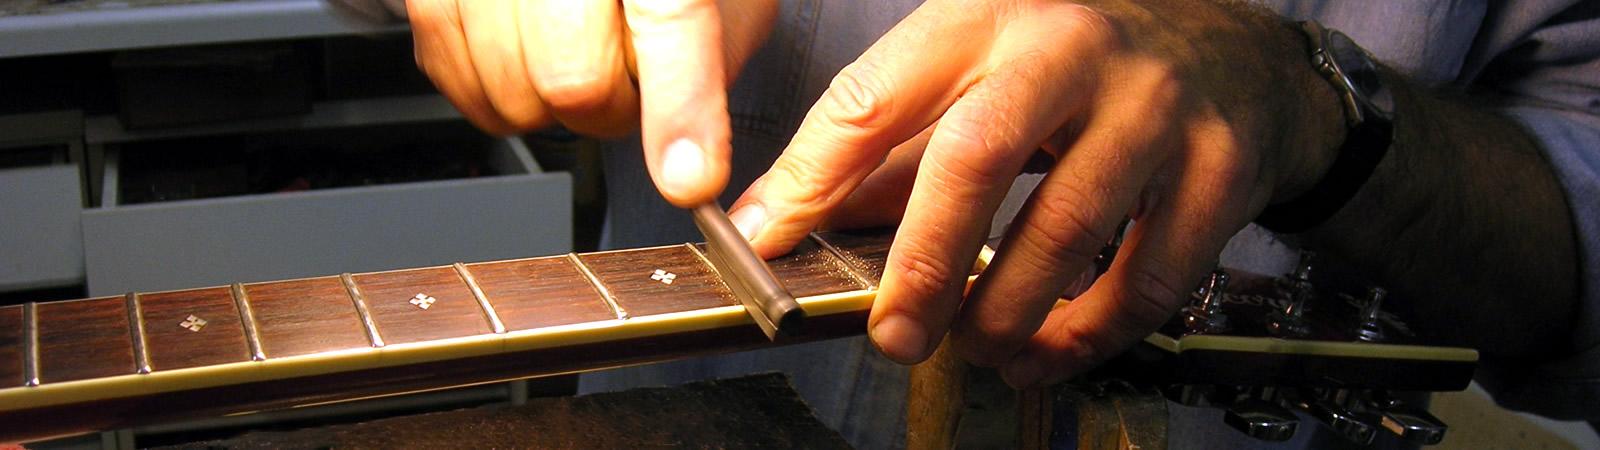 Krueger Guitars Home Page guitar services banner image